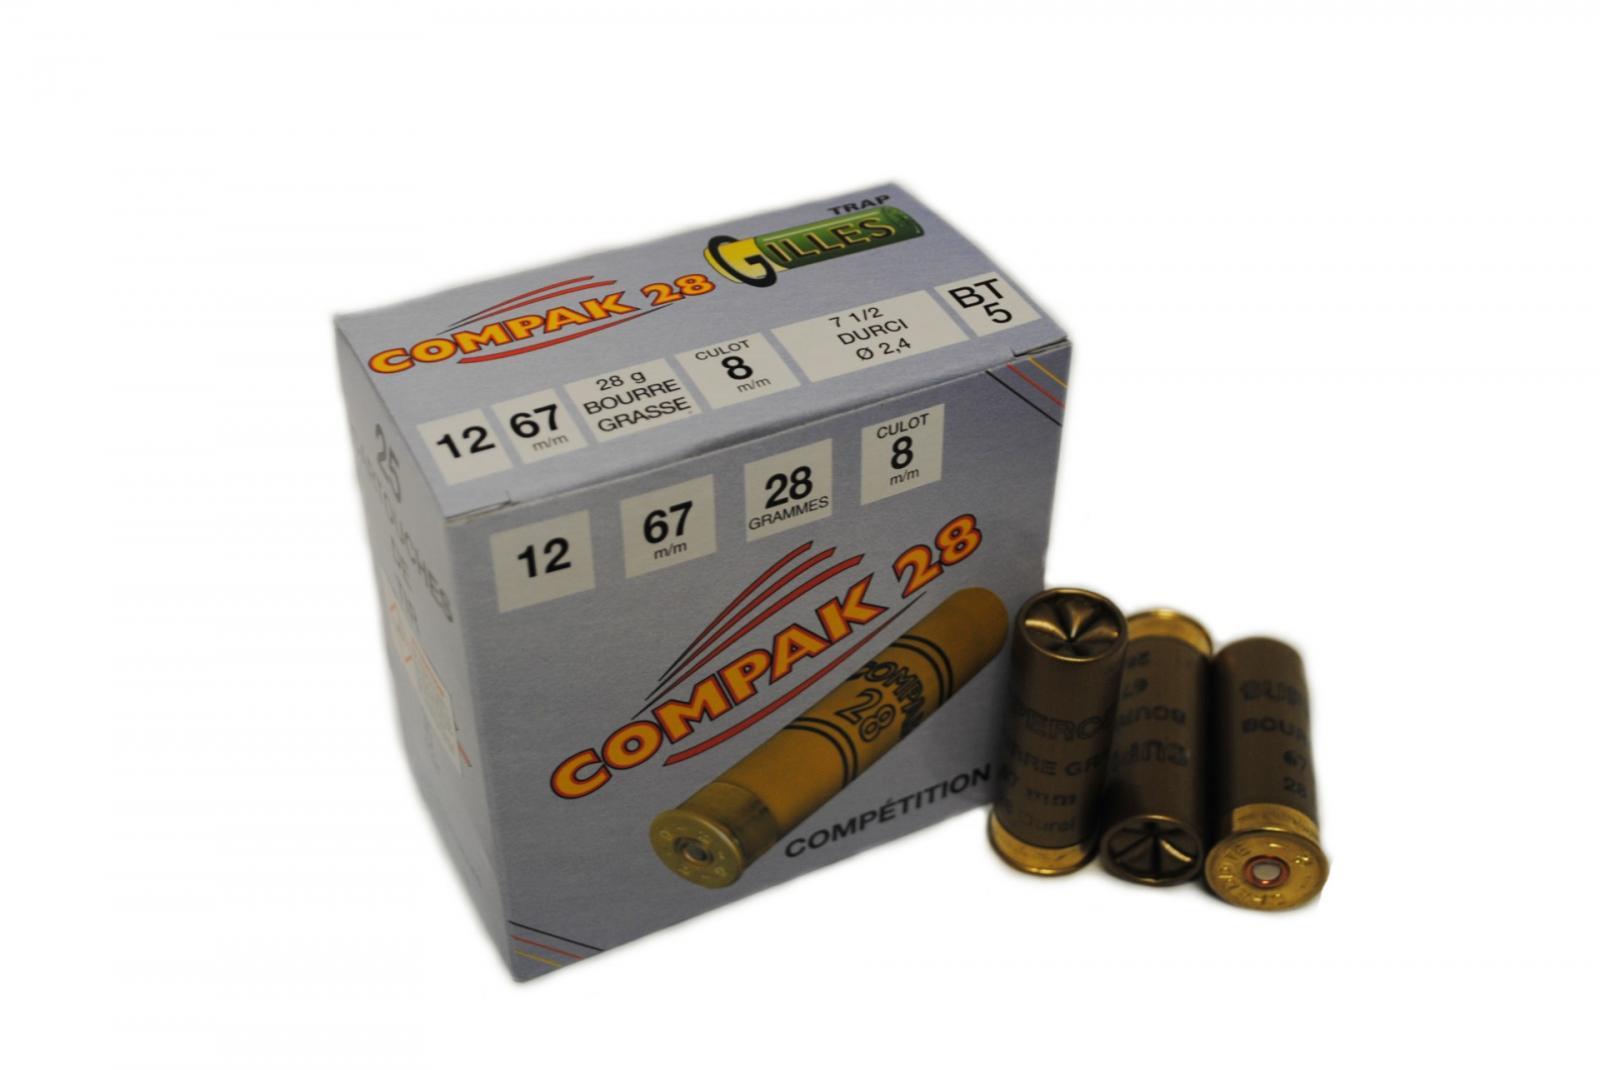 Boite de 25 cartouches CHOK SUPER COMPAK cal 12 BT5